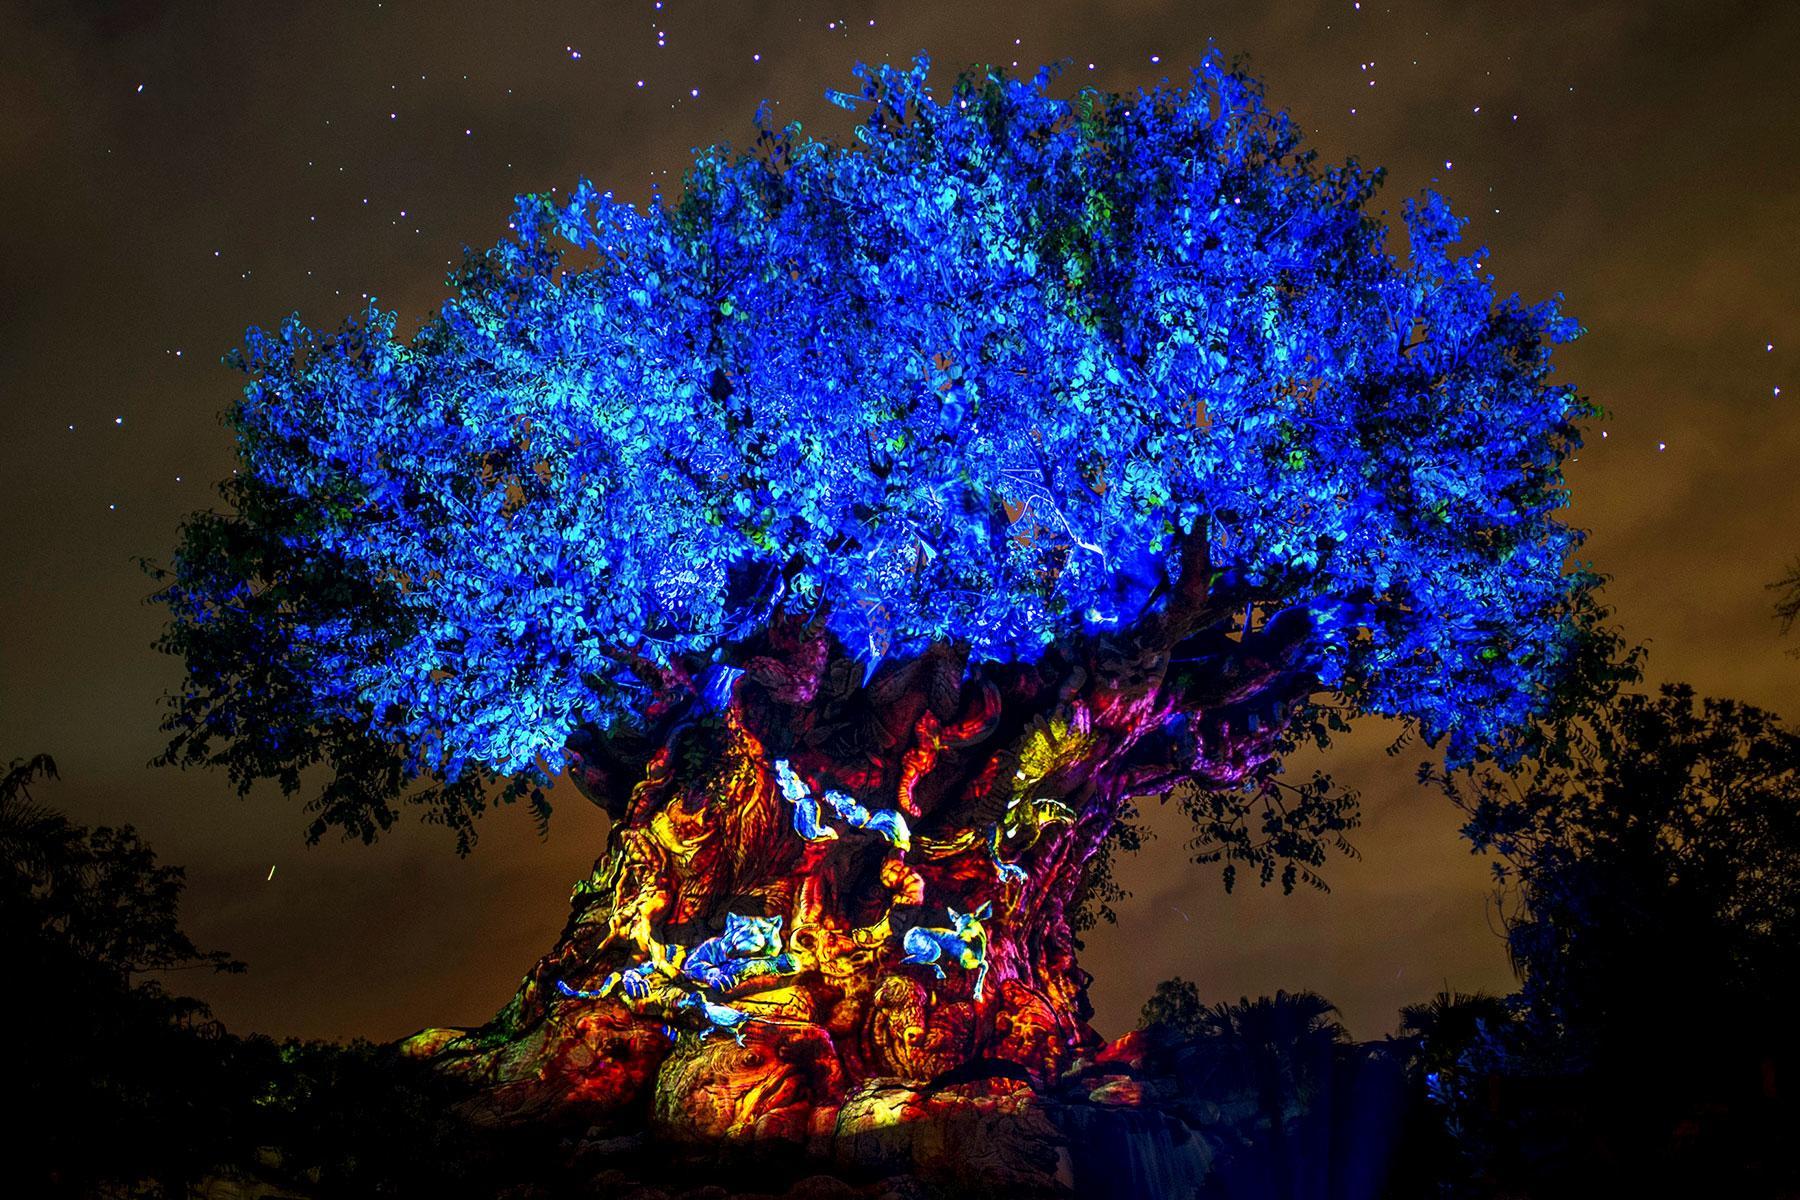 Фантастическое дерево фото